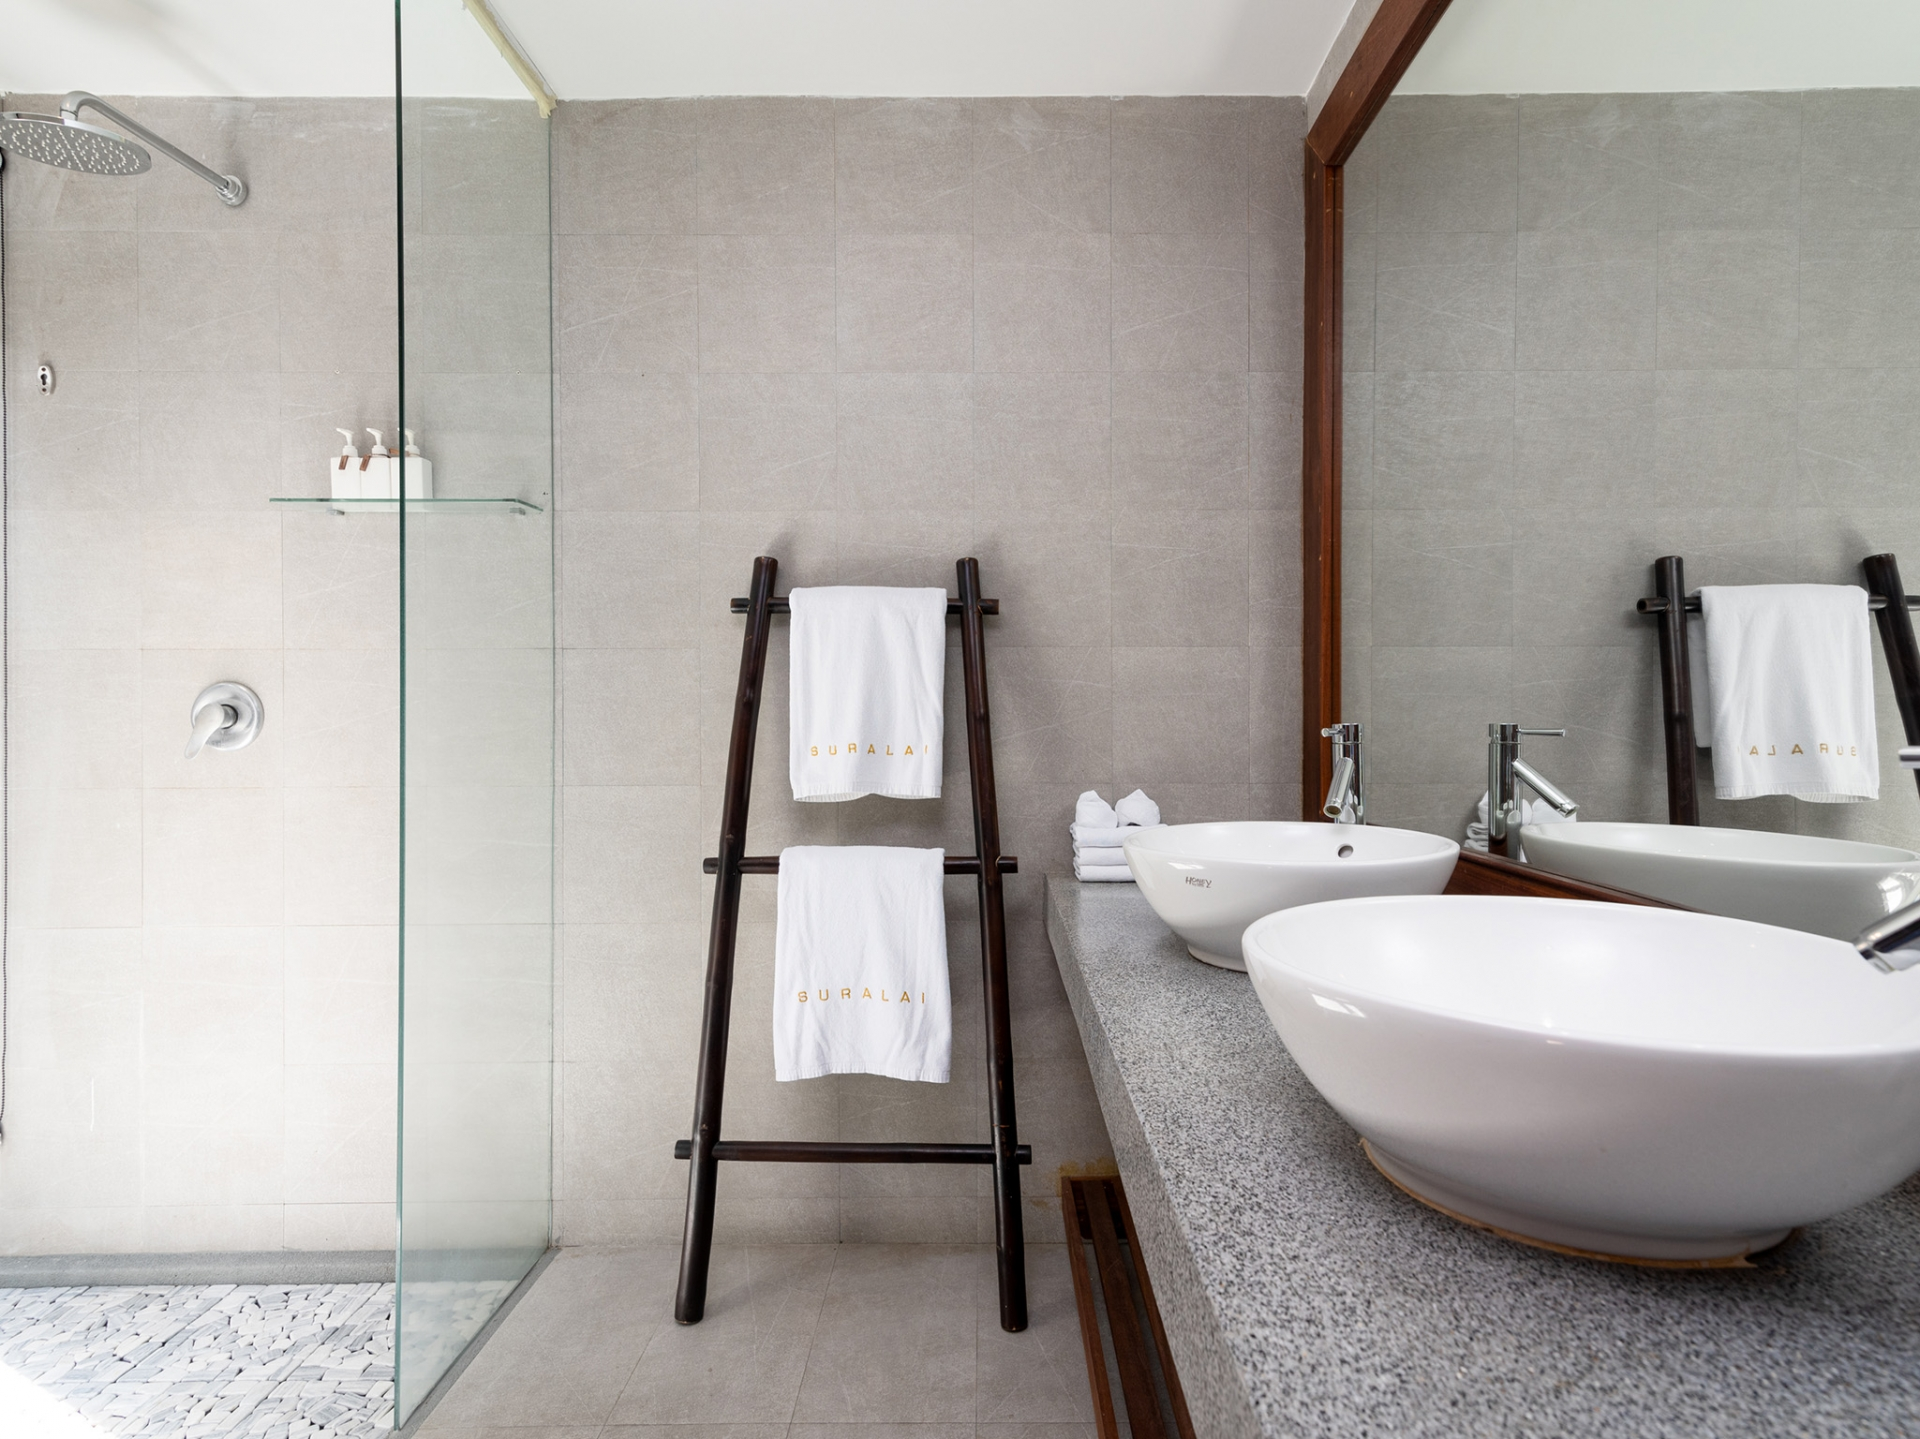 Breathtaking Family Villa-020 Villa Suralai - Ensuite bathroom details.jpg